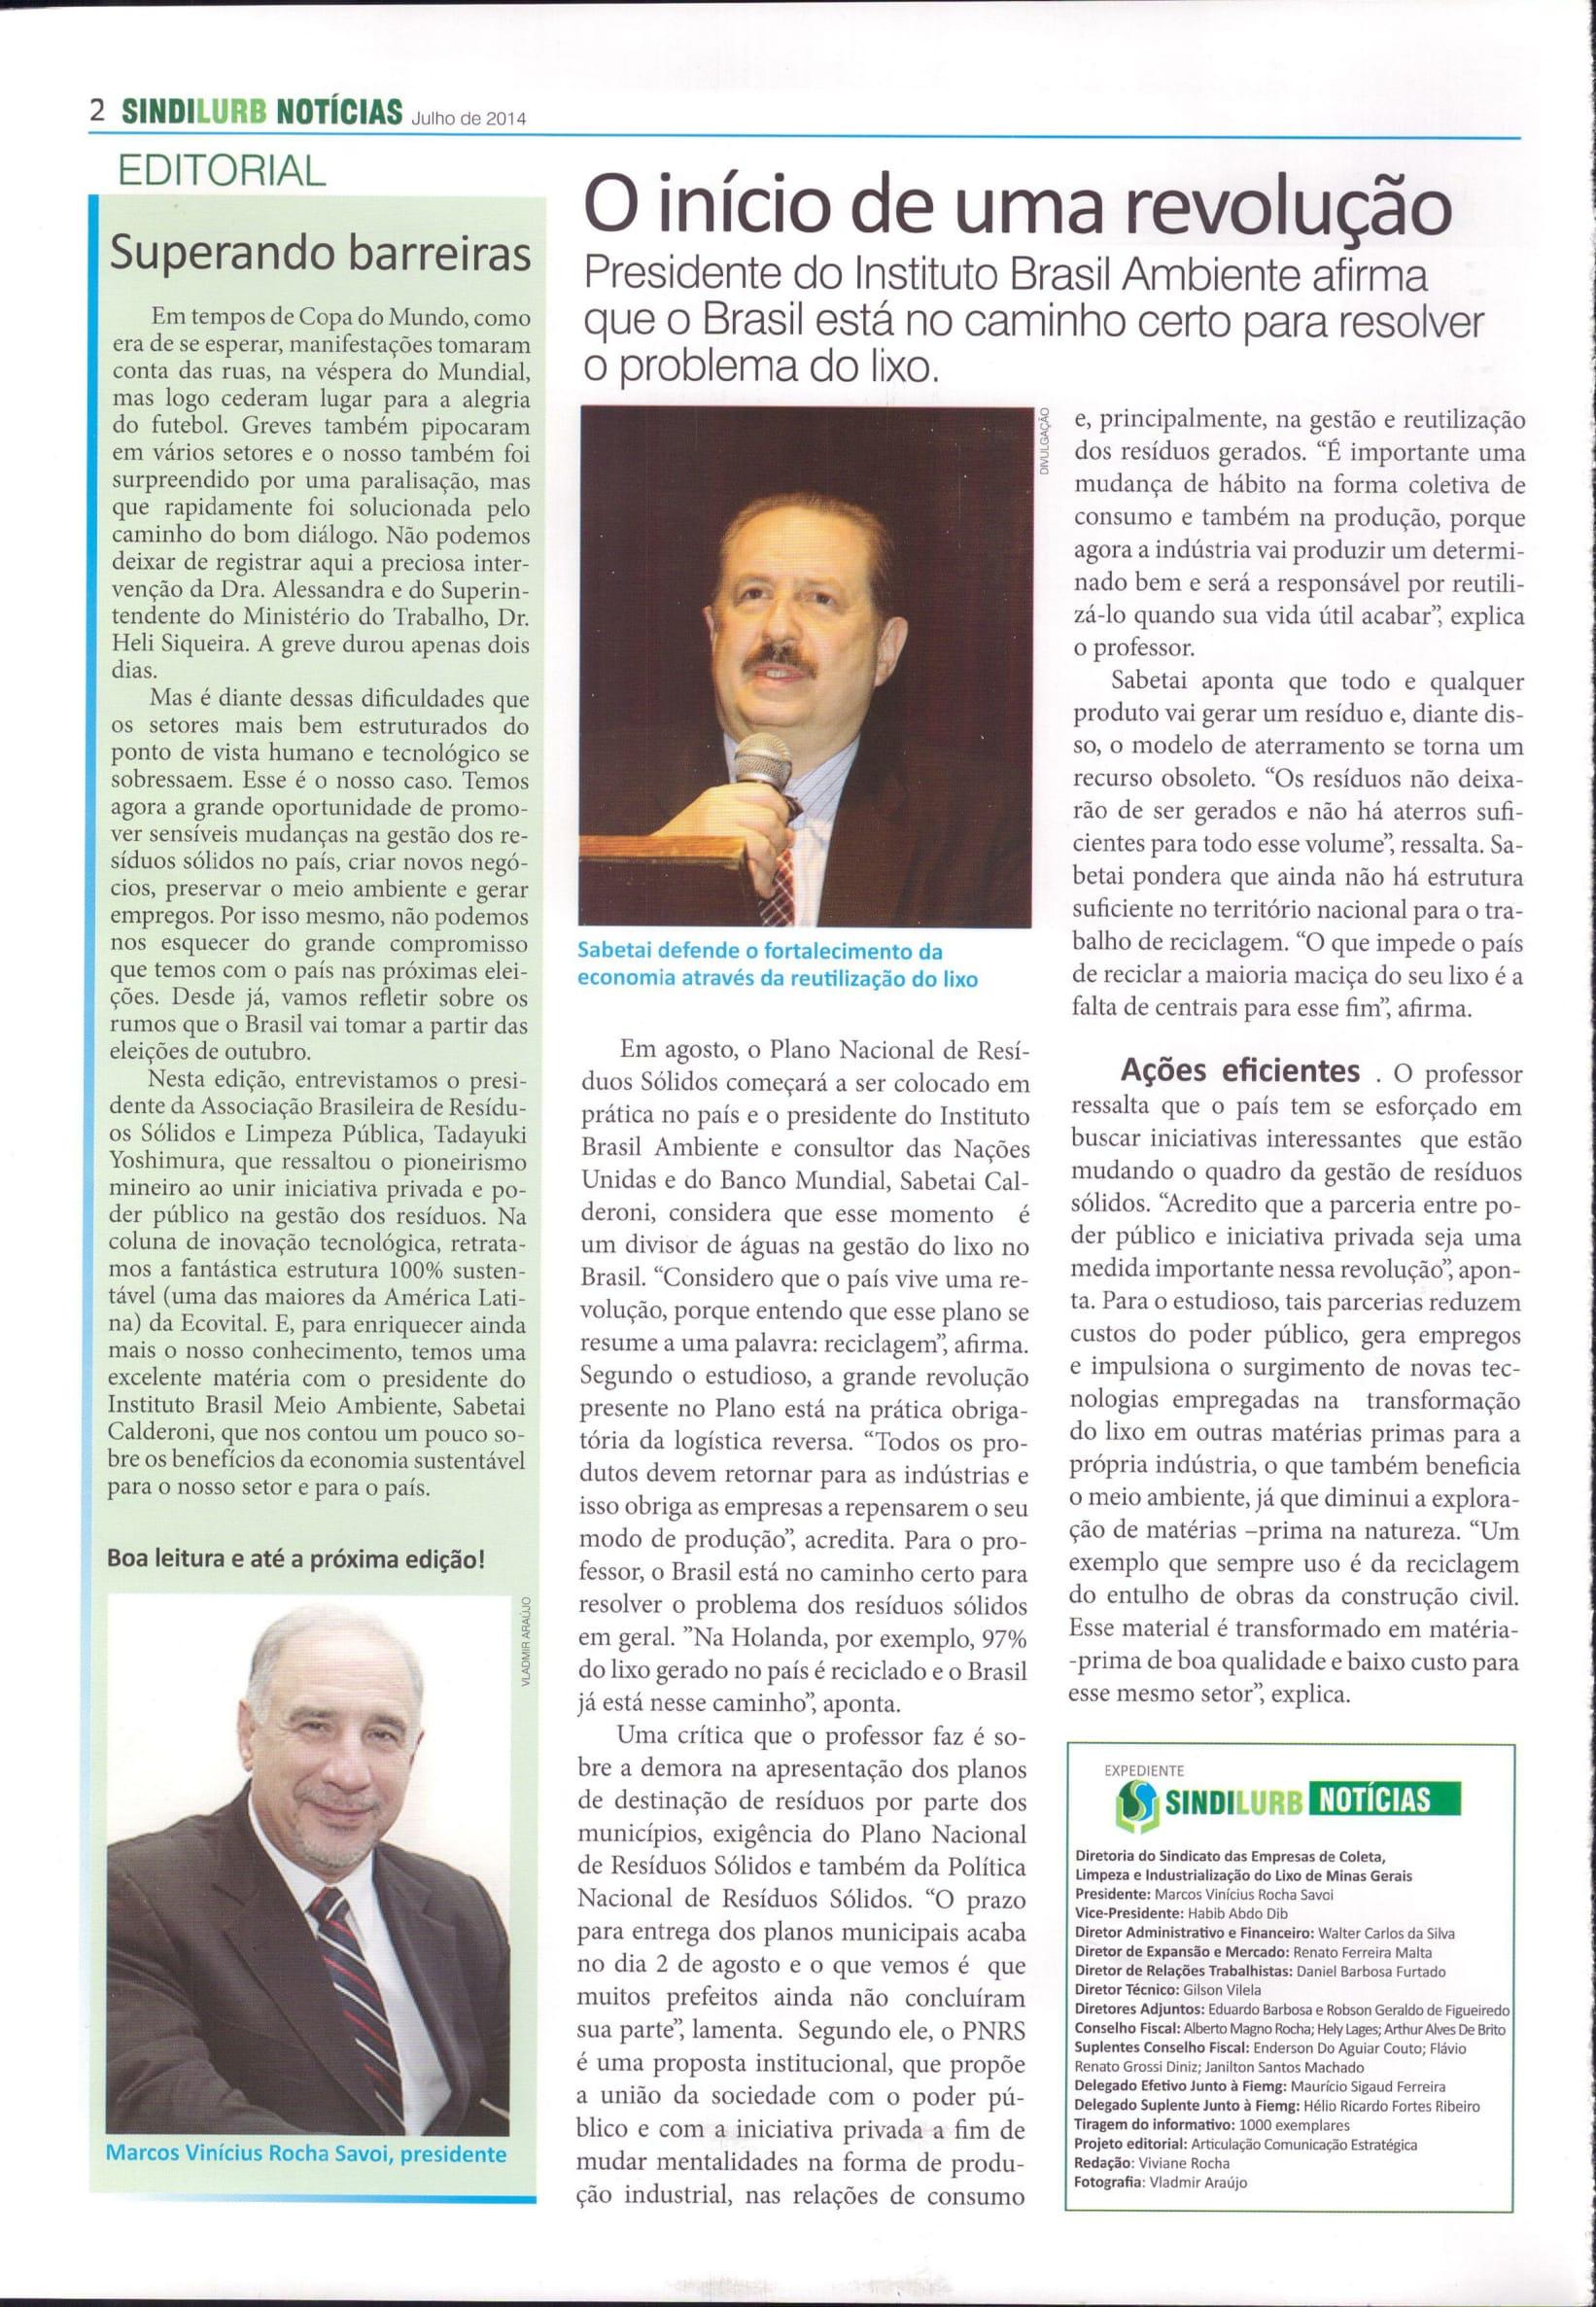 jornal-sindilurb-edicao_6-2